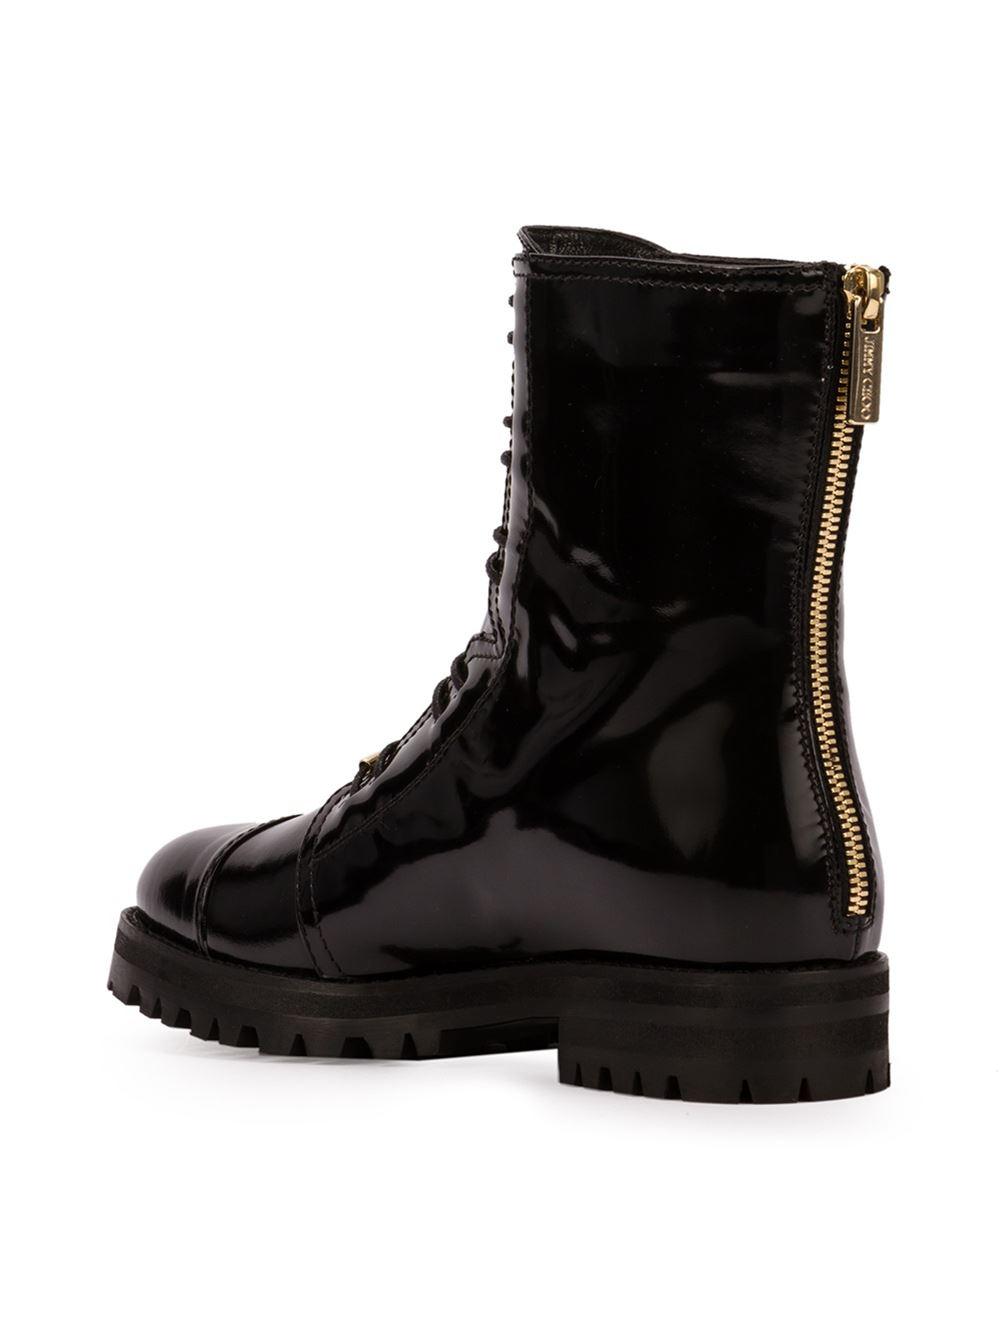 Lyst Jimmy Choo Haze Leather Combat Boots In Black